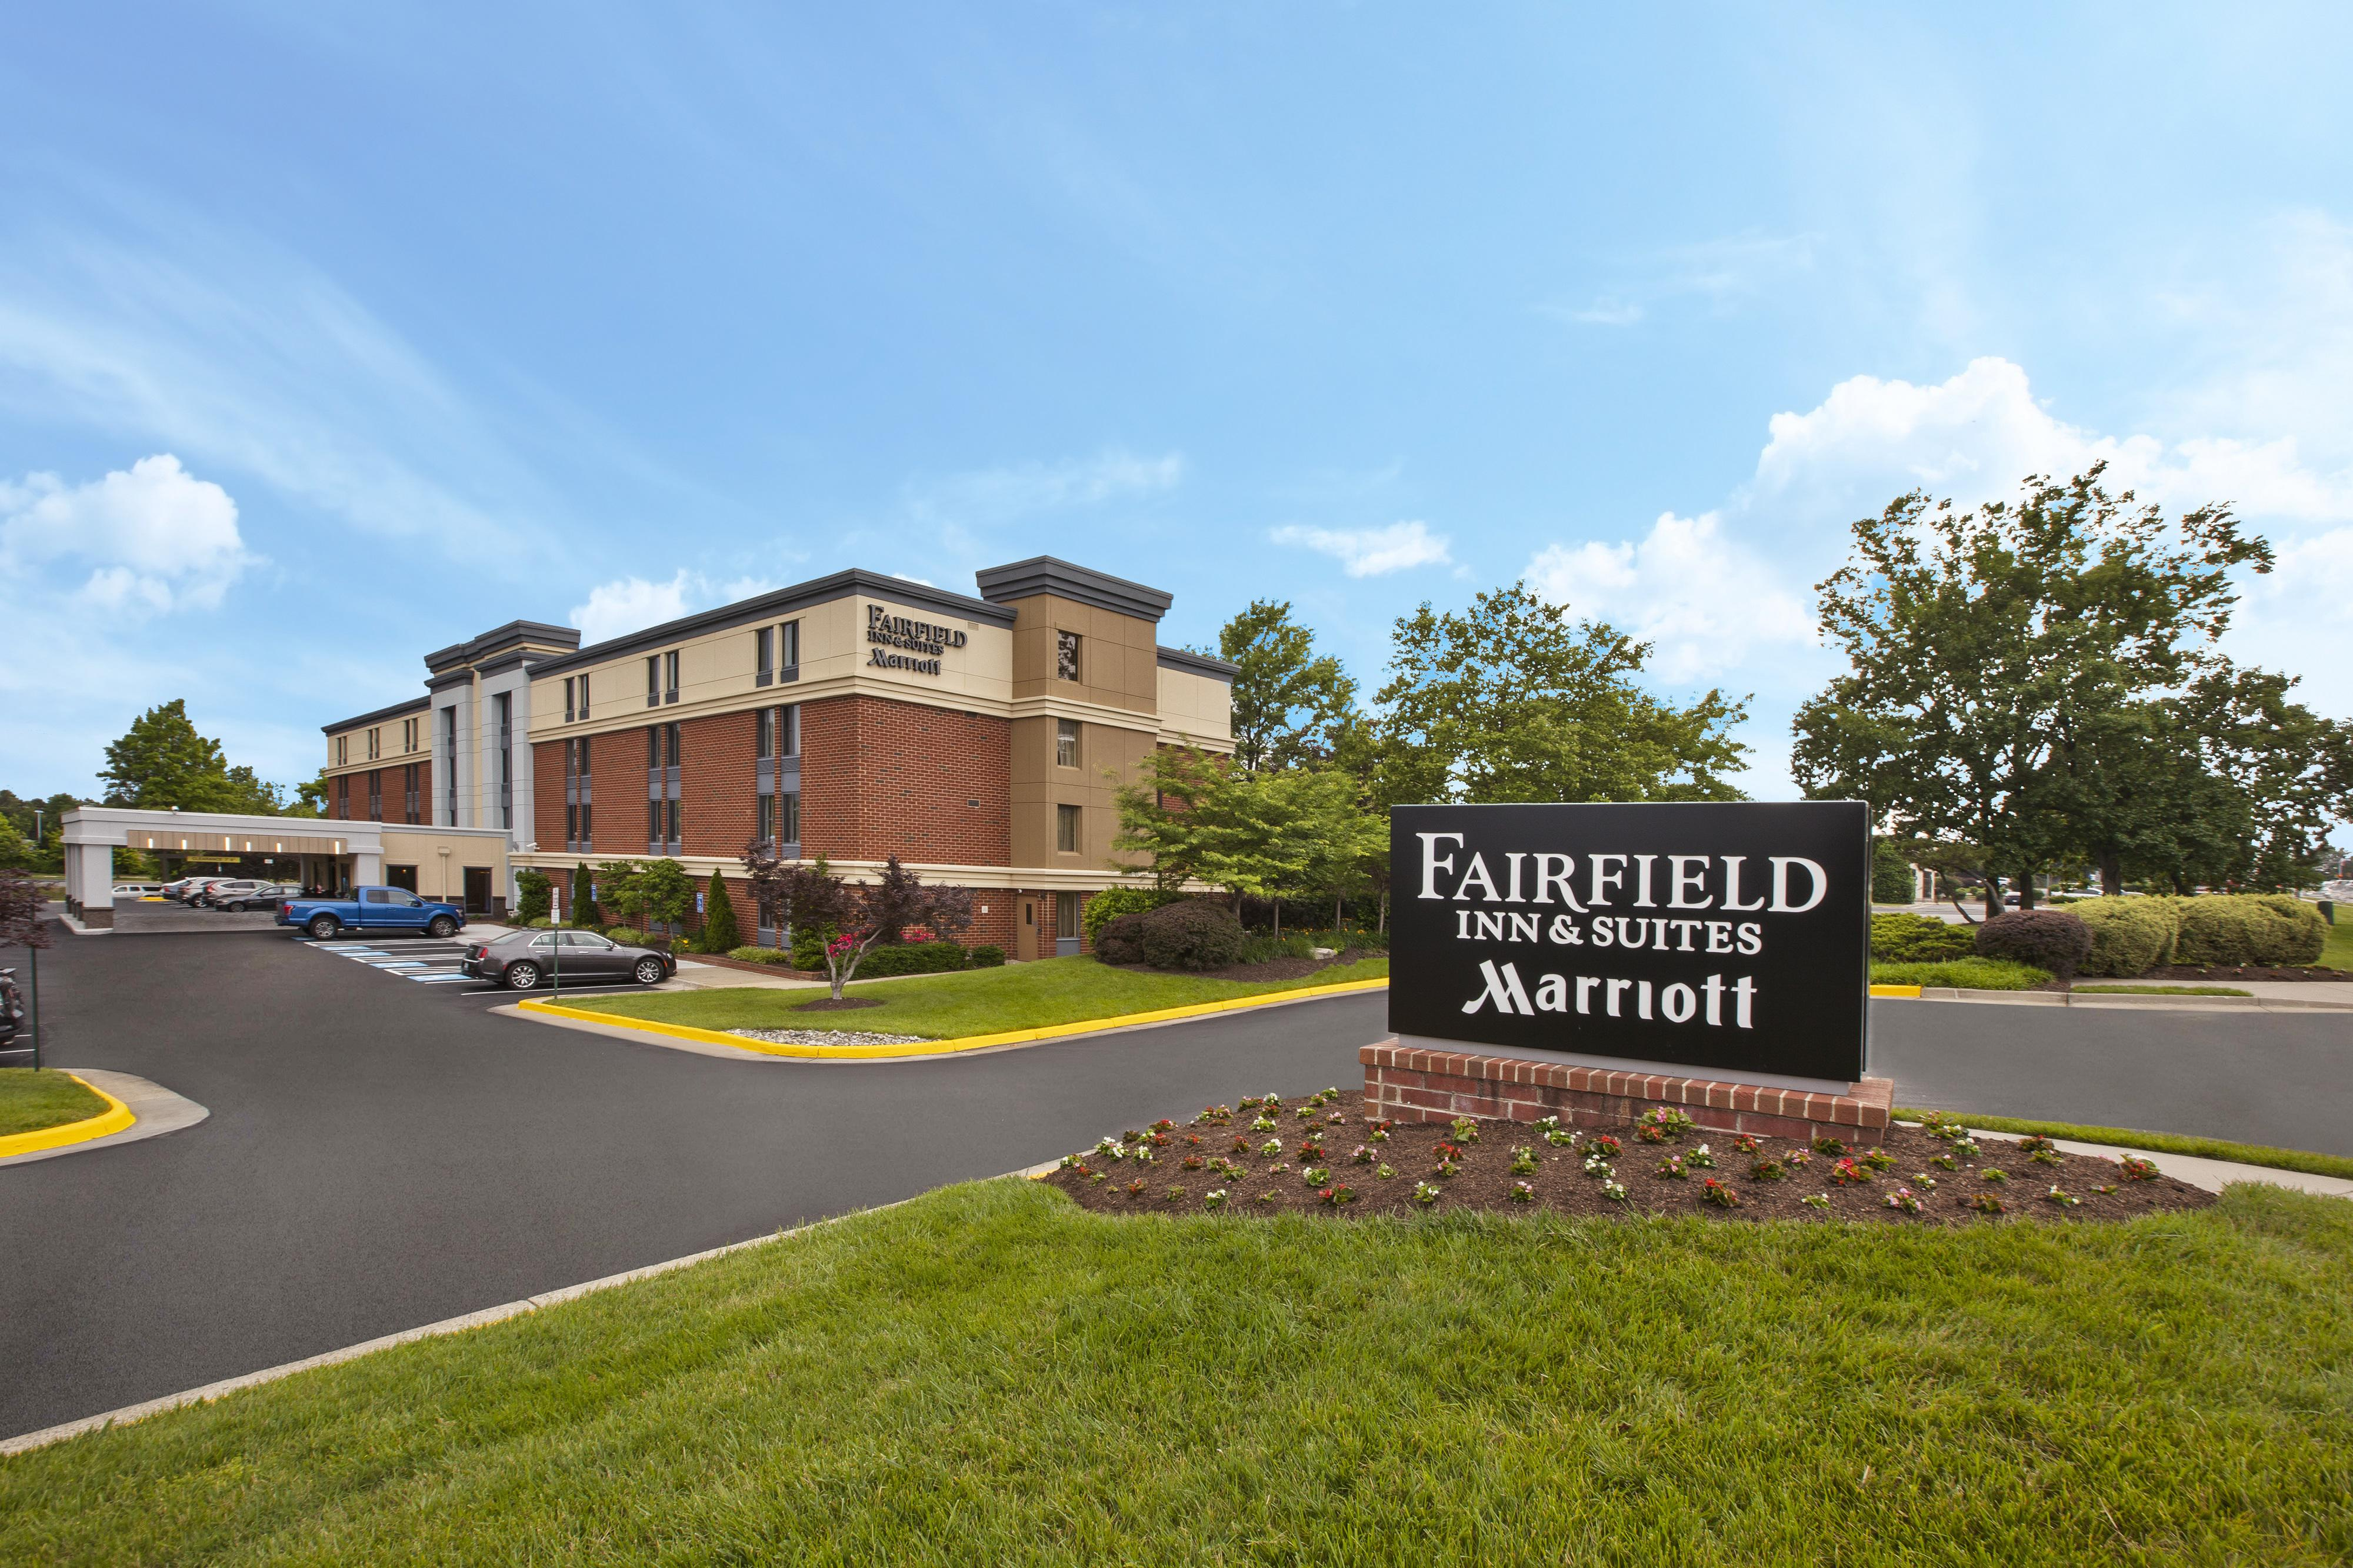 Fairfield Inn & Suites by Marriott Dulles Airport Herndon/Reston image 0